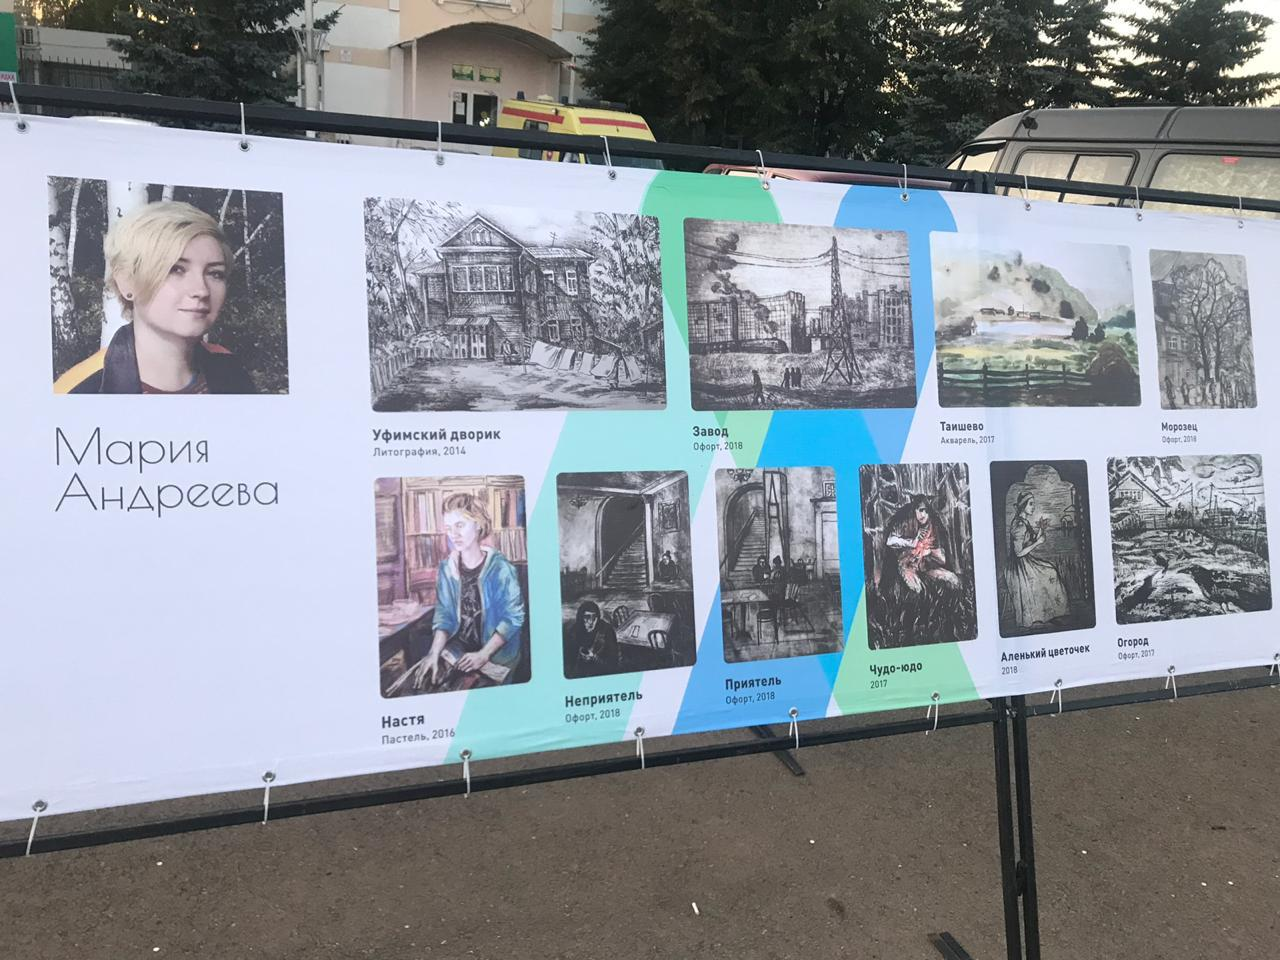 Праздник в Давлеканово: концерт от телеканала «Туган тел» и компании «Уфанет»